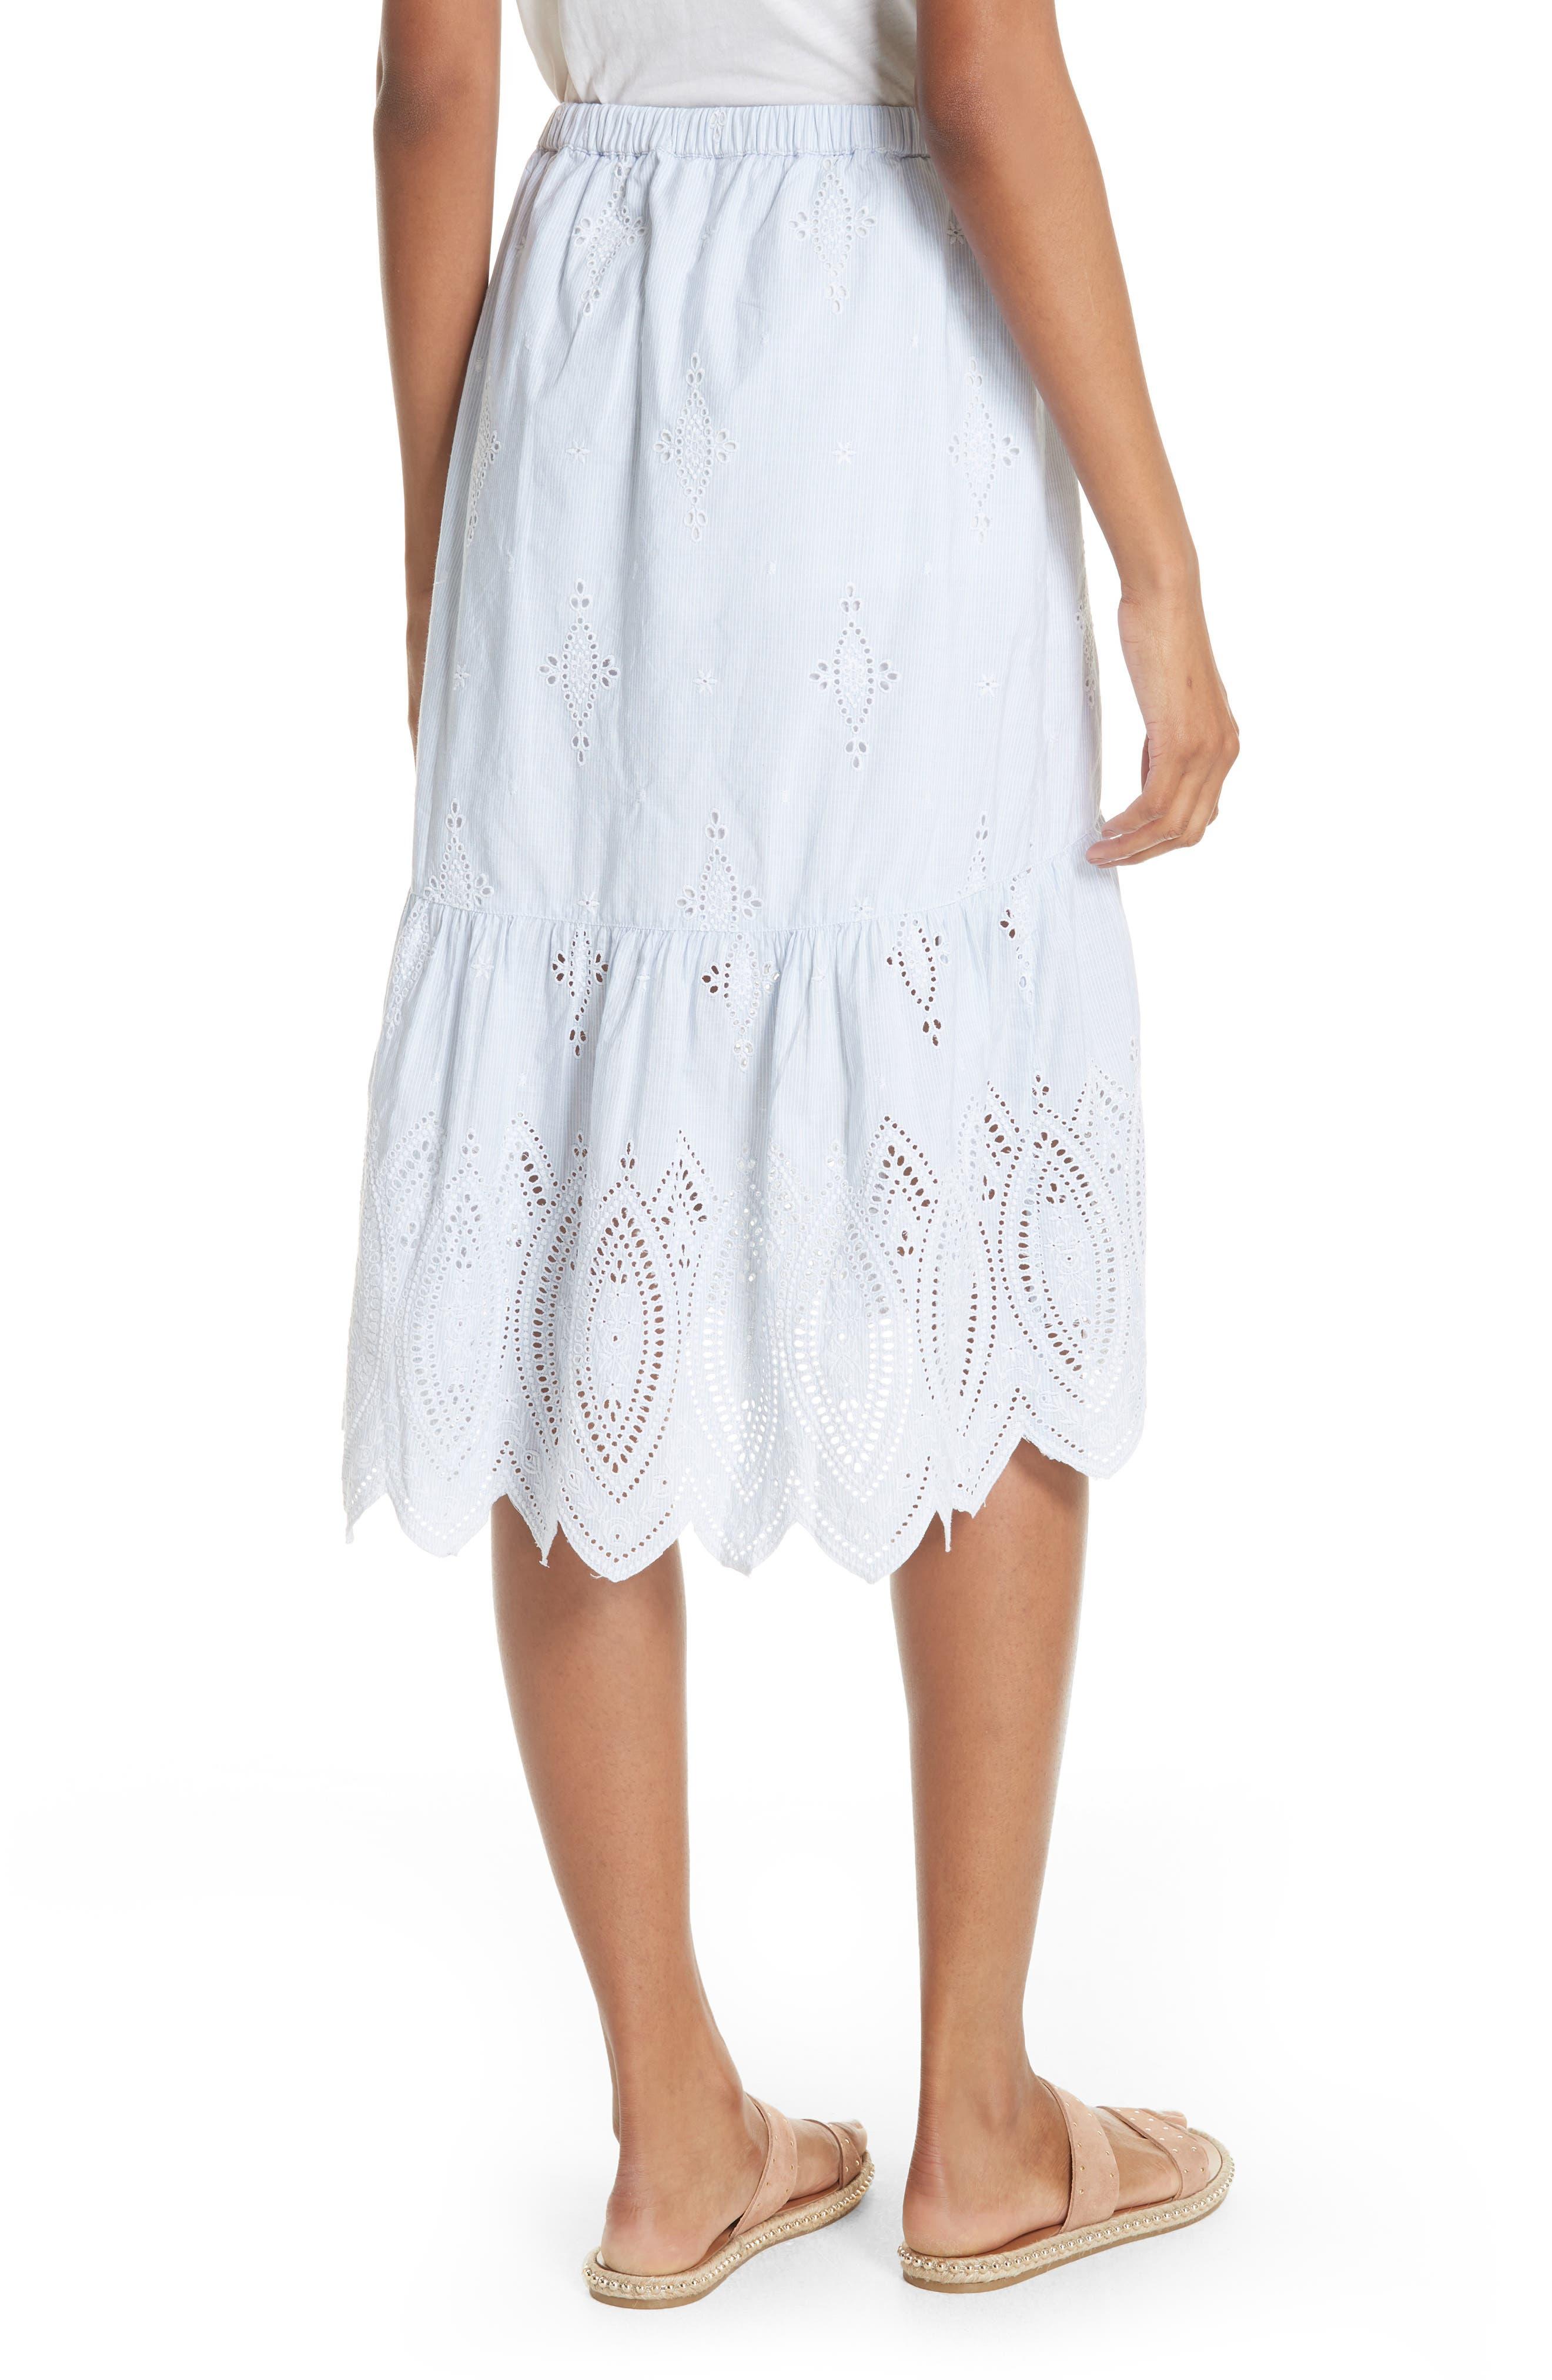 Chantoya Eyelet Scallop Hem Cotton Skirt,                             Alternate thumbnail 2, color,                             DESERT SKY